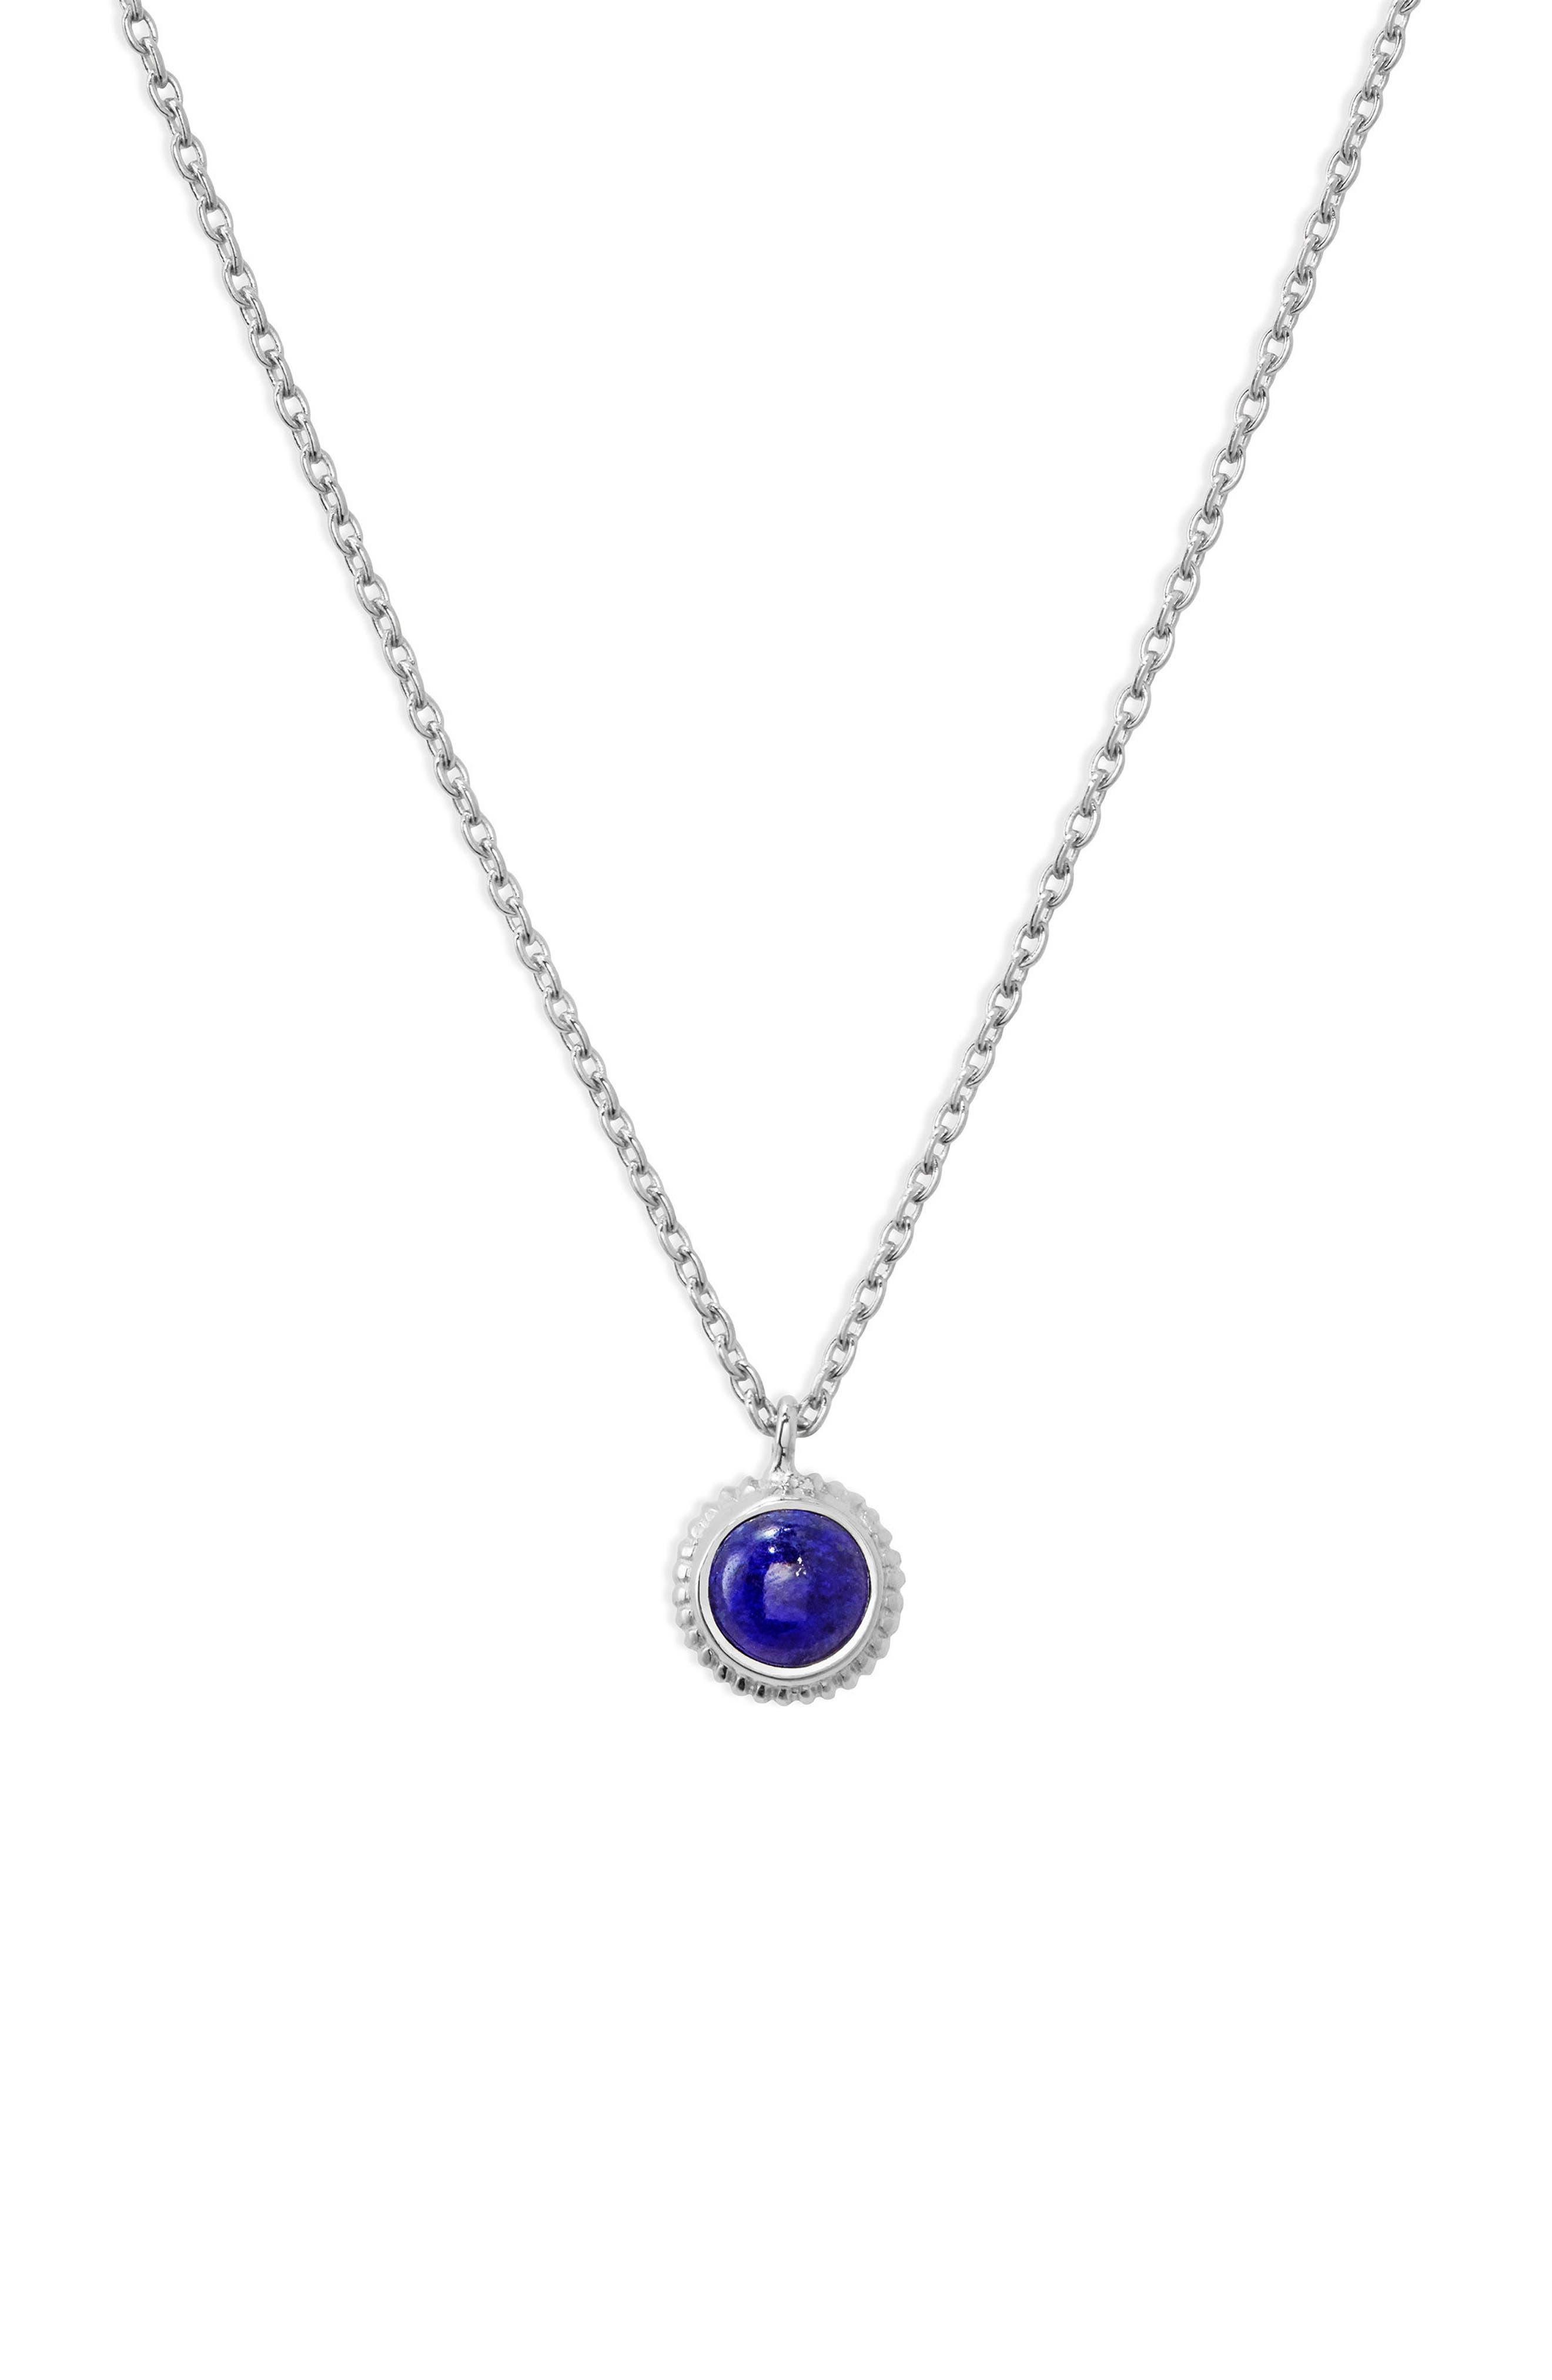 Main Image - Shinola Semiprecious Stone Pendant Necklace